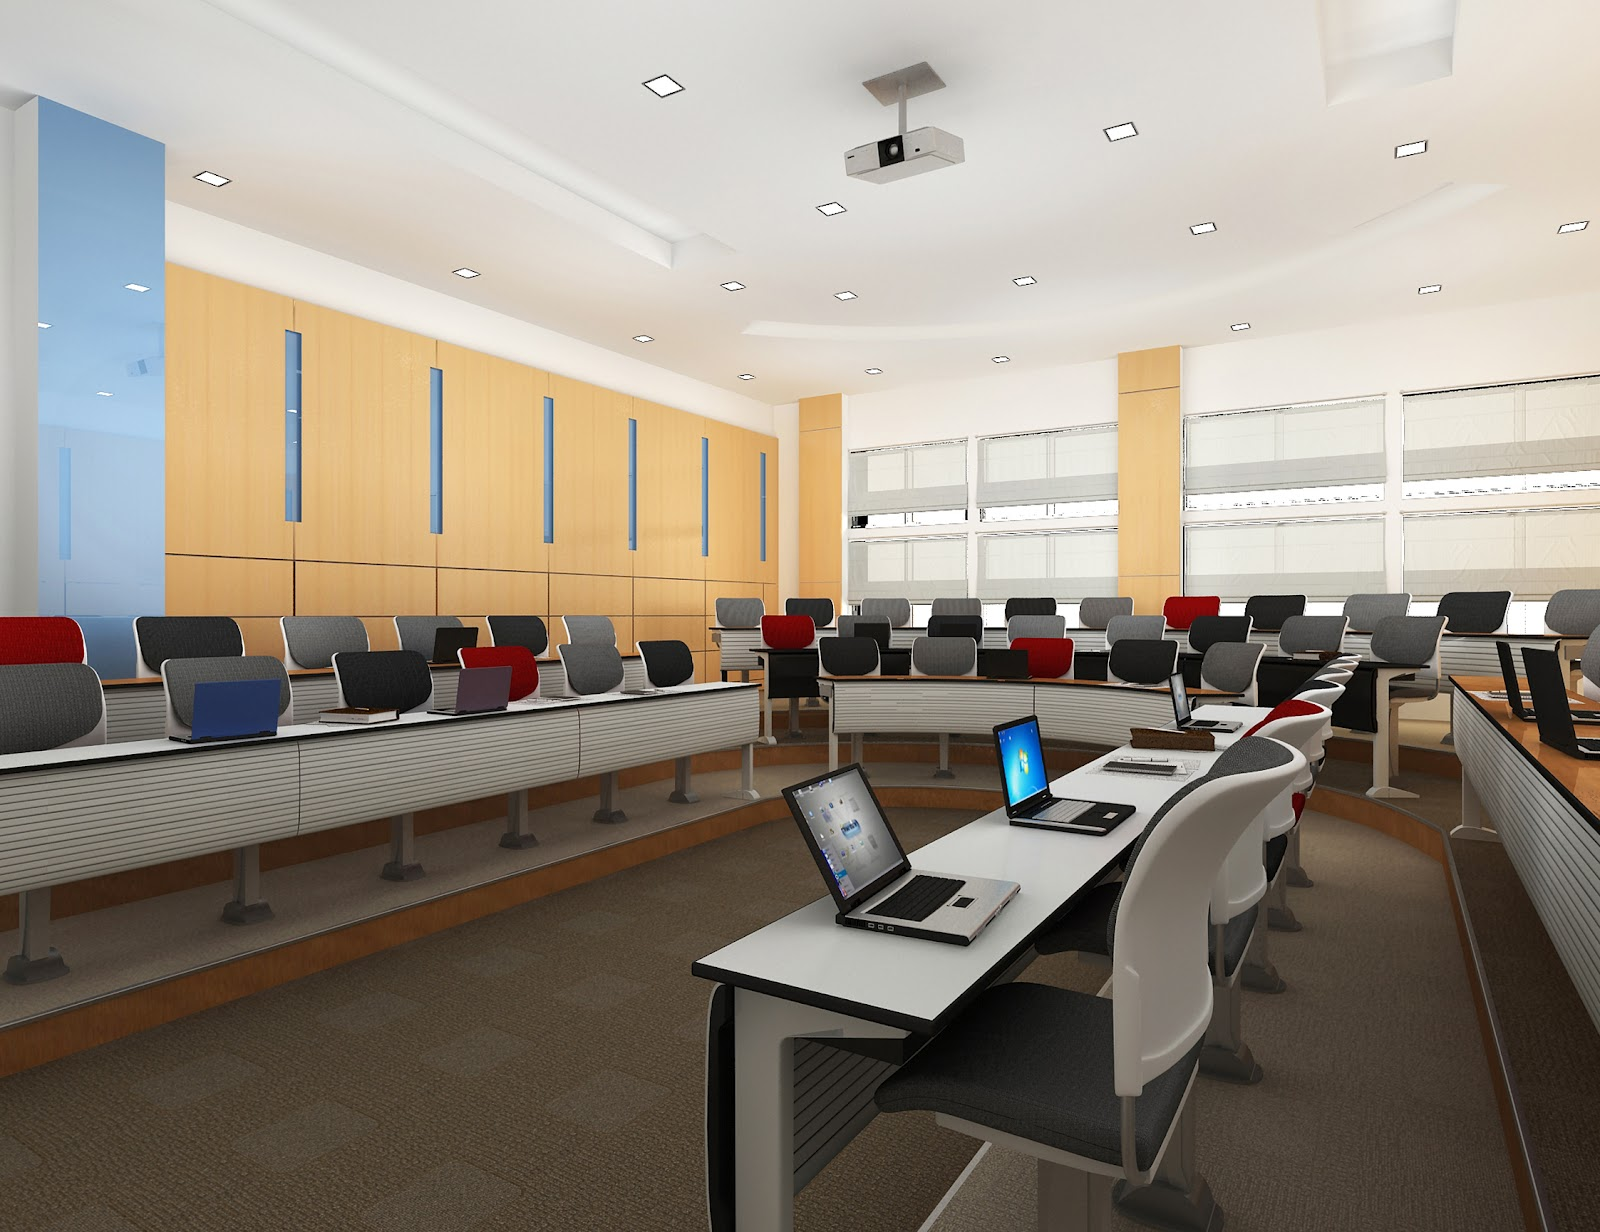 Work experience sunway university graduate school design for Interior design work experience